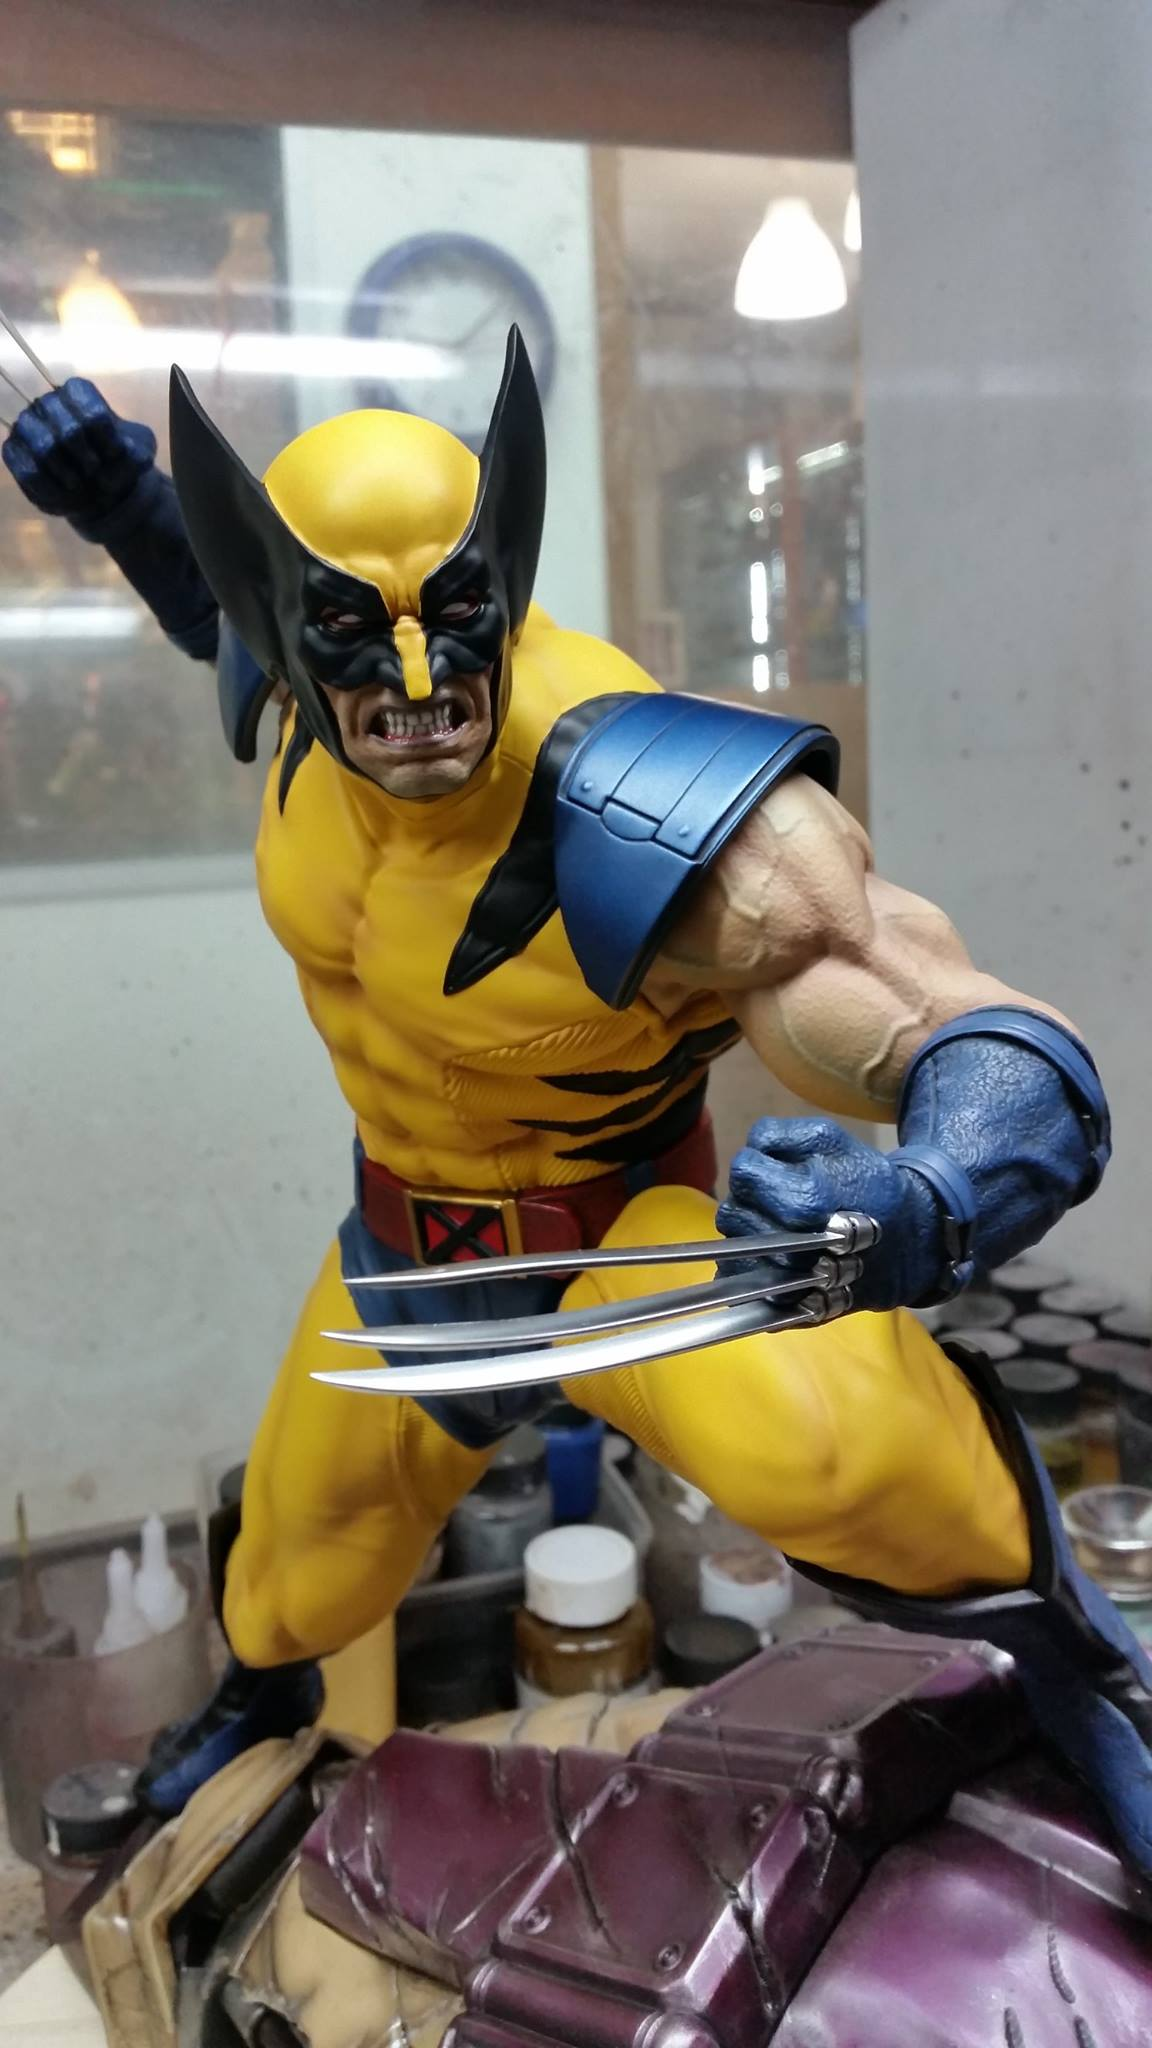 Premium Collectibles : Wolverine - Comics Version - Page 2 4990661046060714171091318431151700177611781895484o